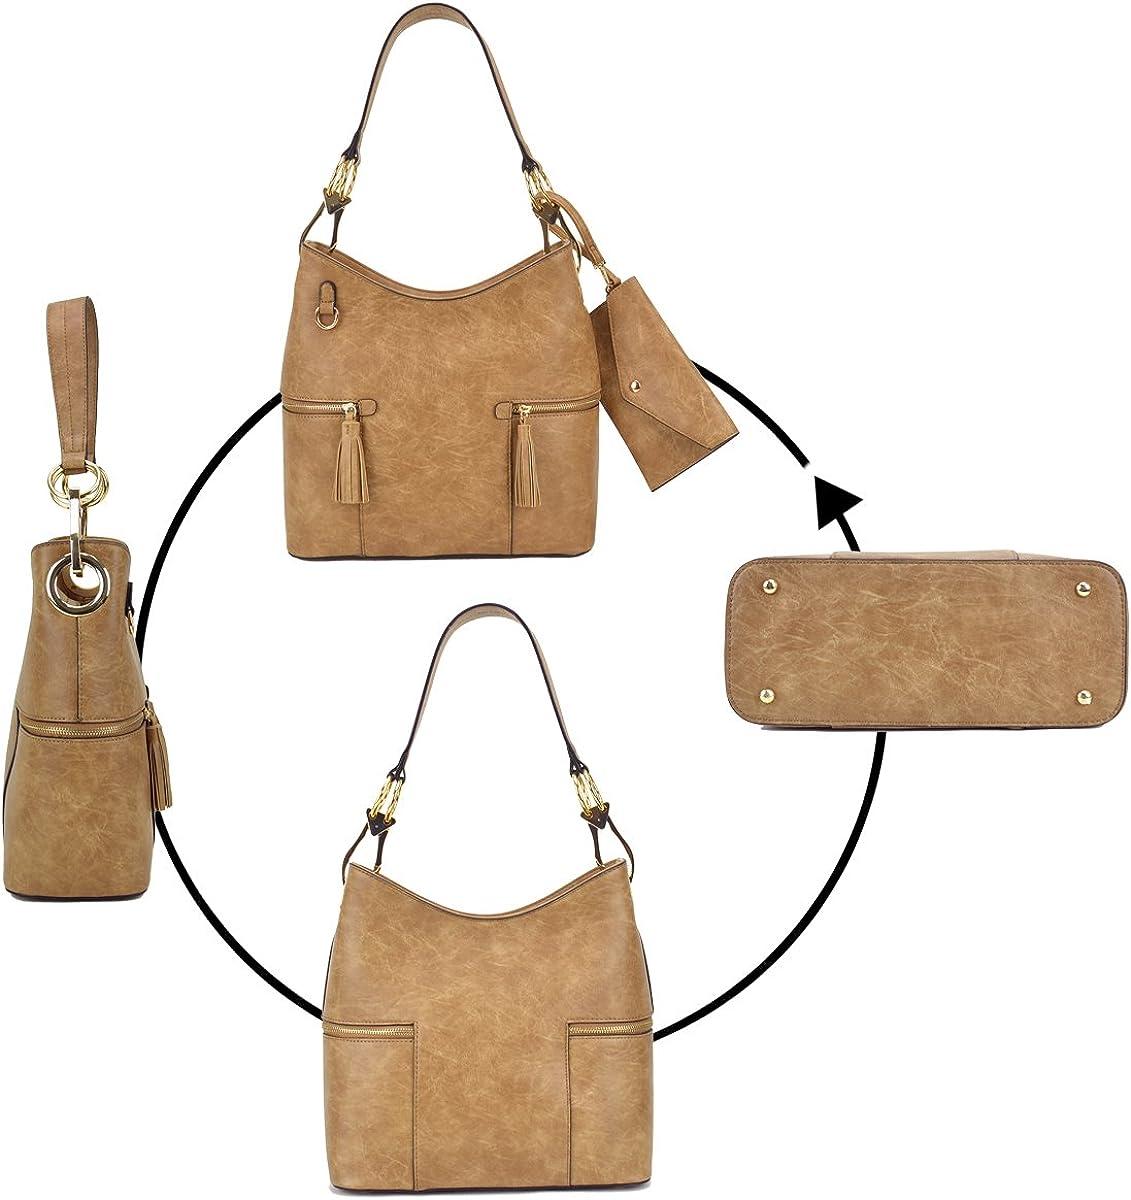 Women Fashion Hobo Shoulder Bags Vegan Leather Tote Purses Bucket Handbags with Big Snap Hook Matching Wristlet